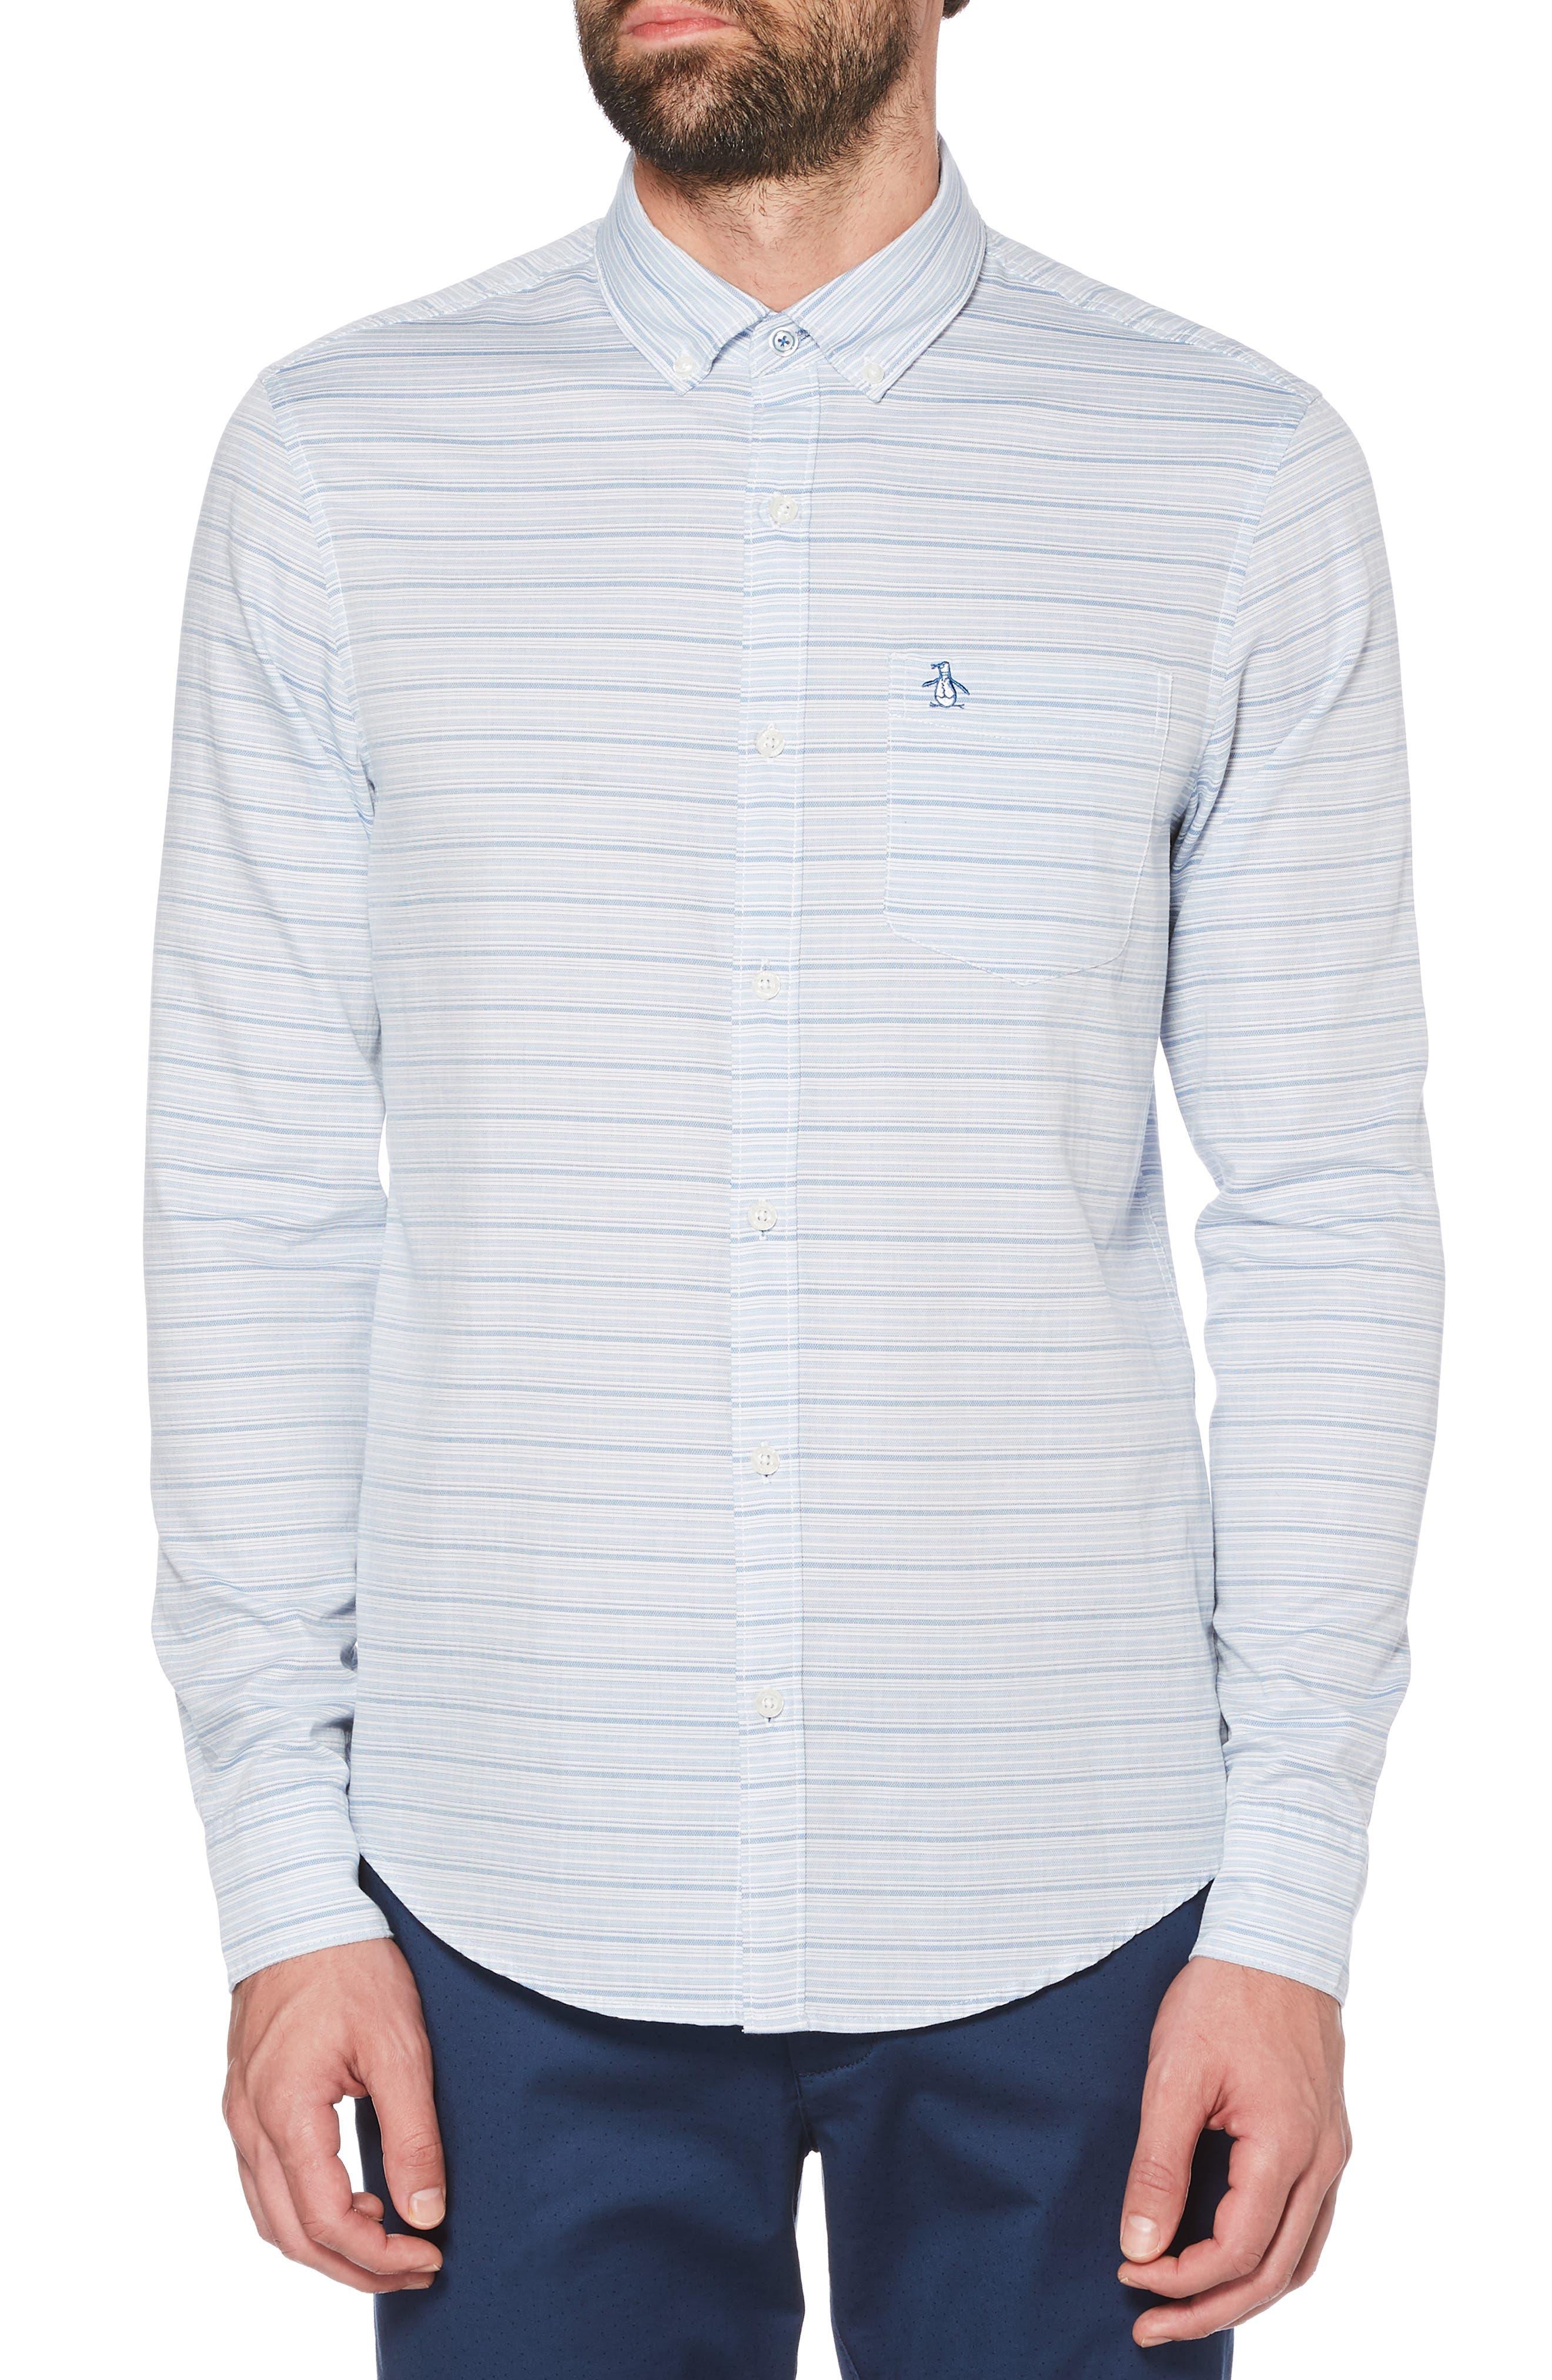 ORIGINAL PENGUIN Slim Fit Dobby Sport Shirt, Main, color, BRIGHT WHITE